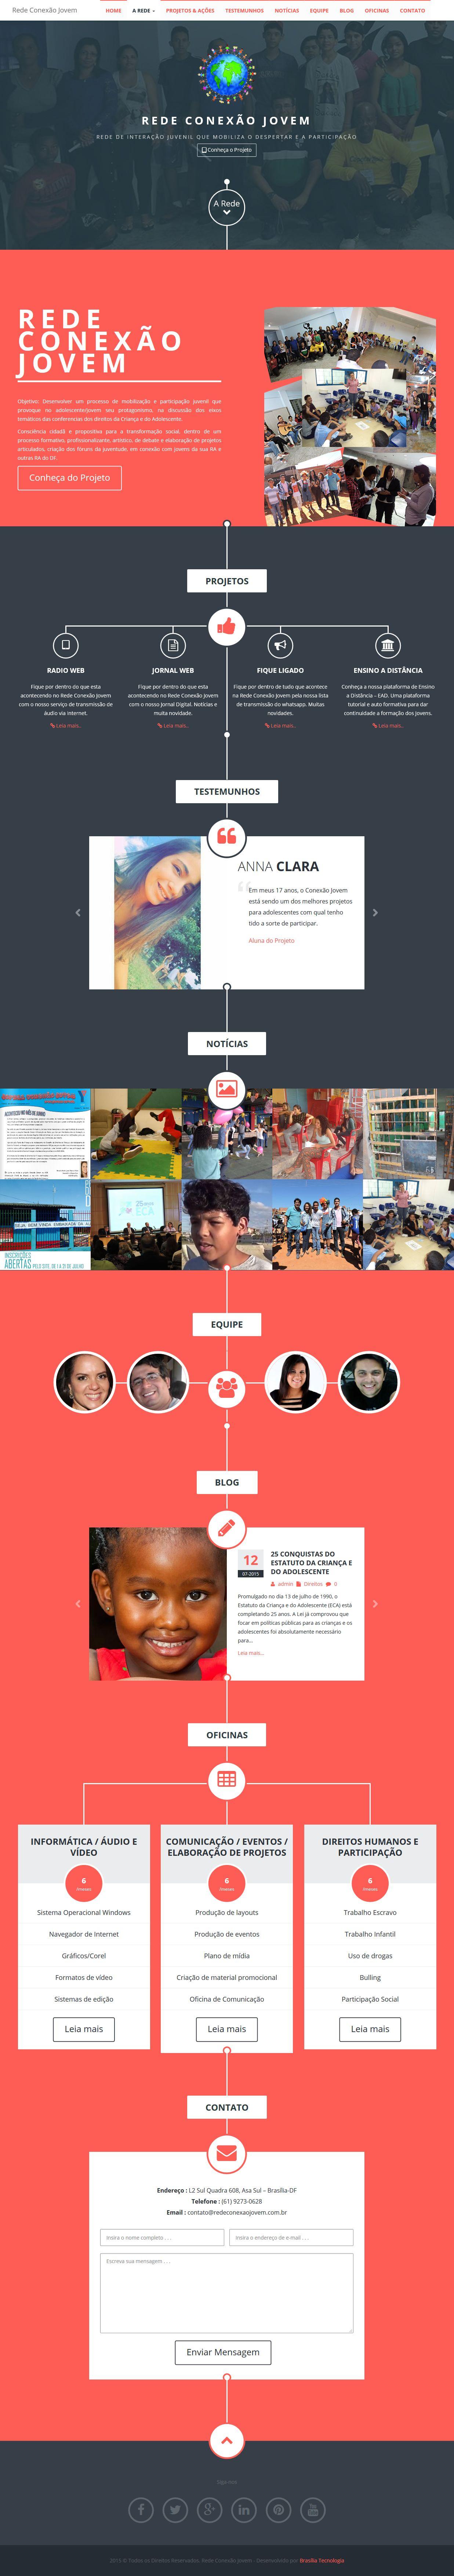 Rede-Conexao-Jovem-brasilia-tecnologia-it-1